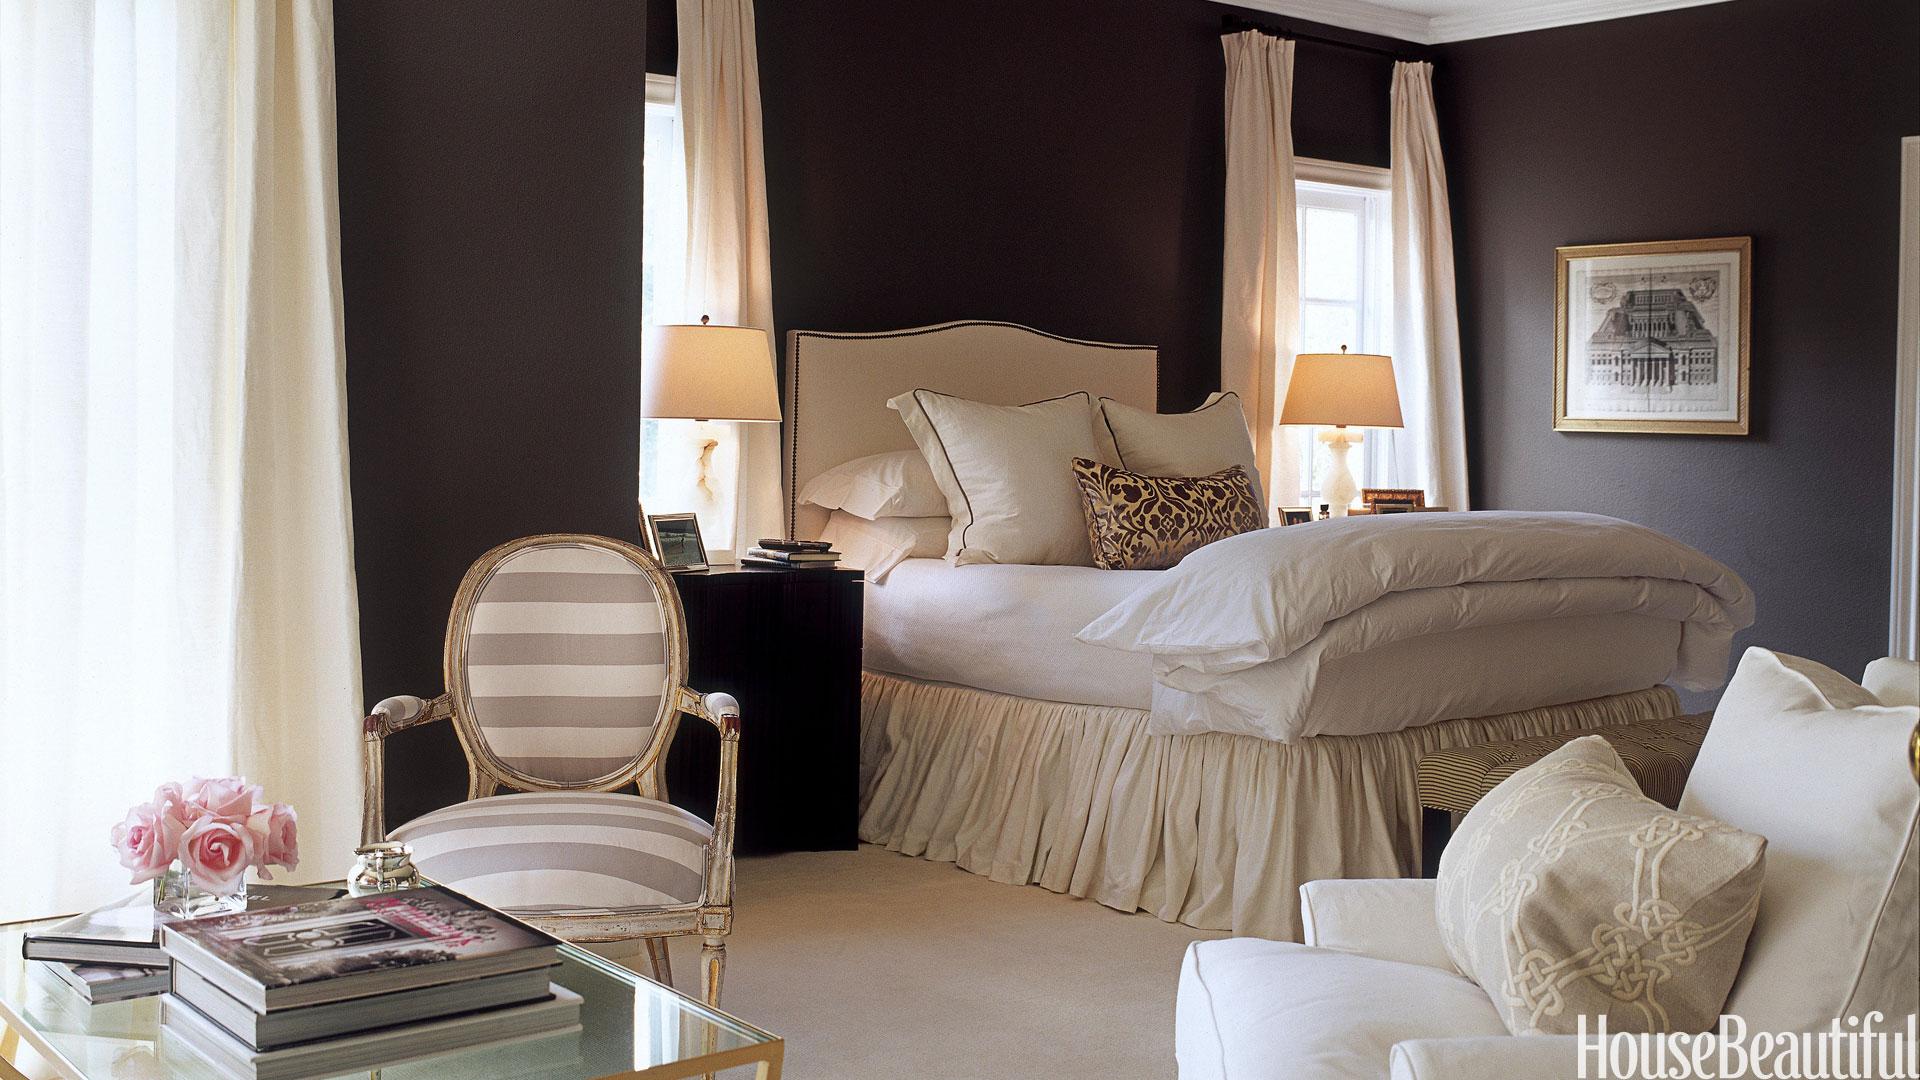 Cozy Bedroom - House Beautiful Pinterest Favorite Pins ...